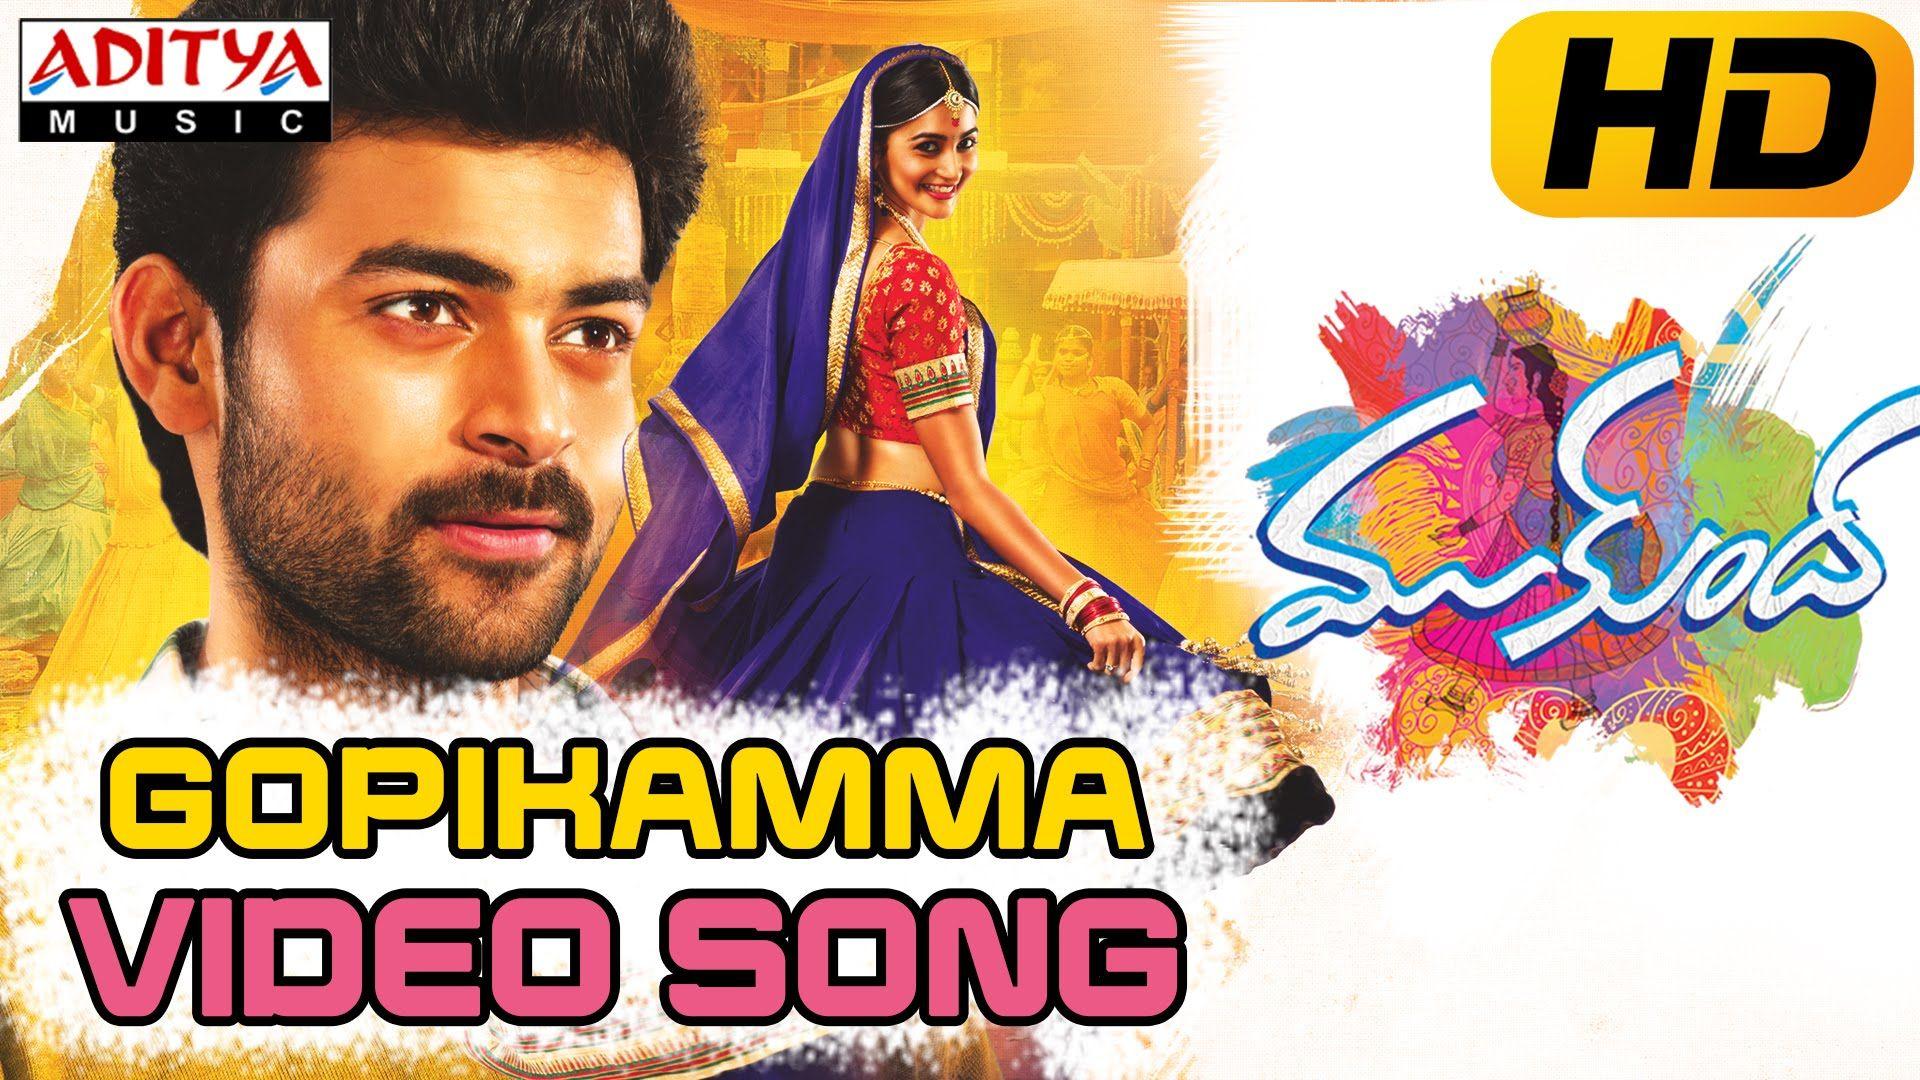 Gopikamma Full Video Song Mukunda Movie Varun Tej Pooja Hegde Songs Movie Songs Varun Tej